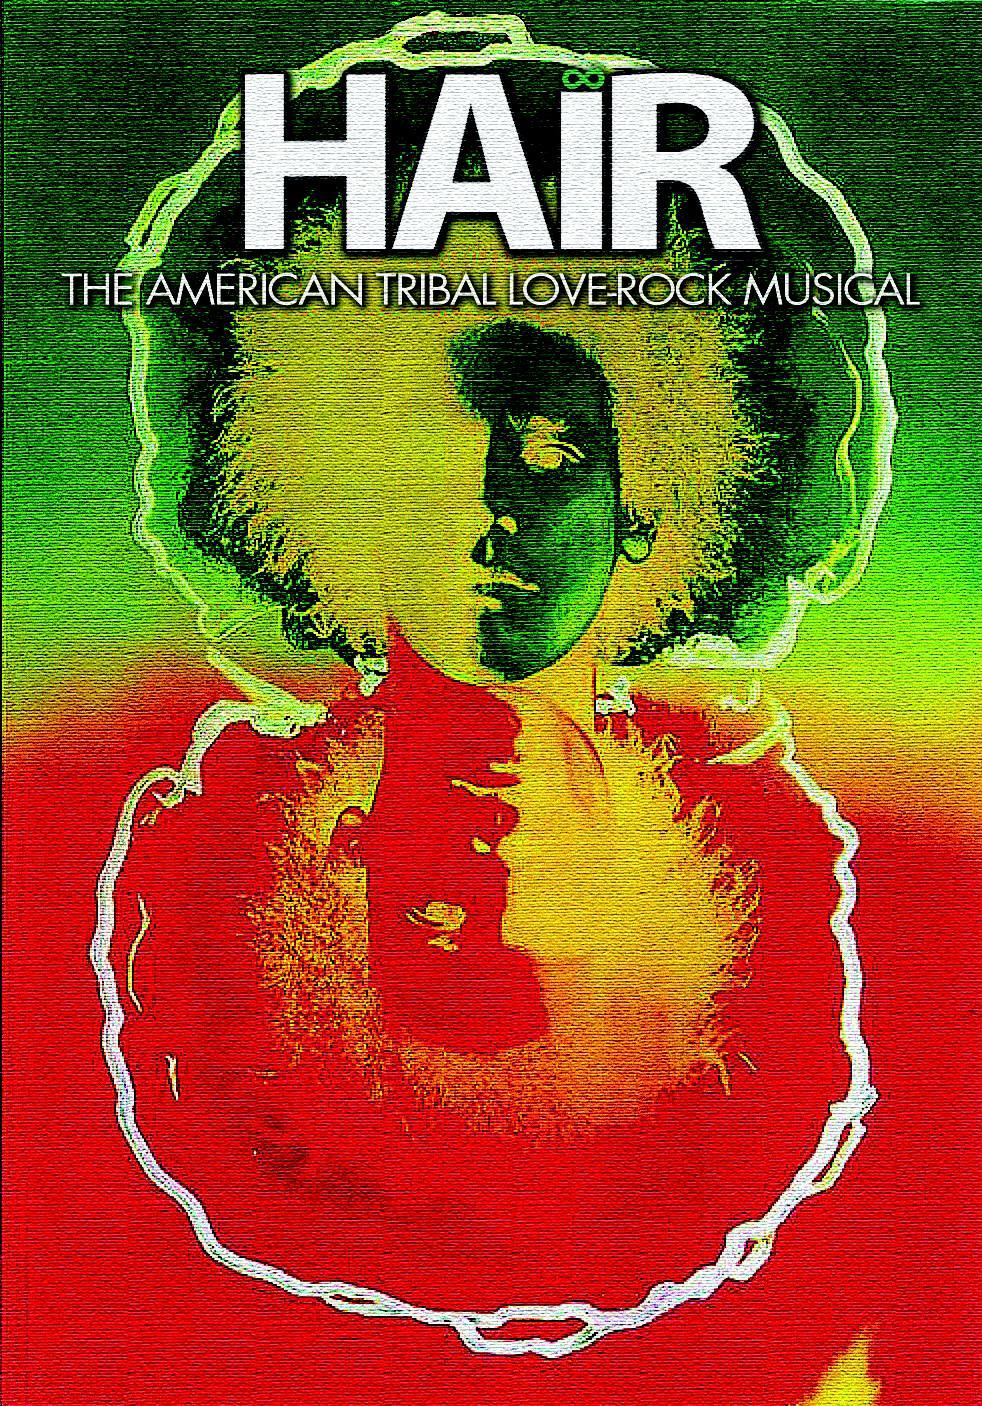 The american tribal love rock musical